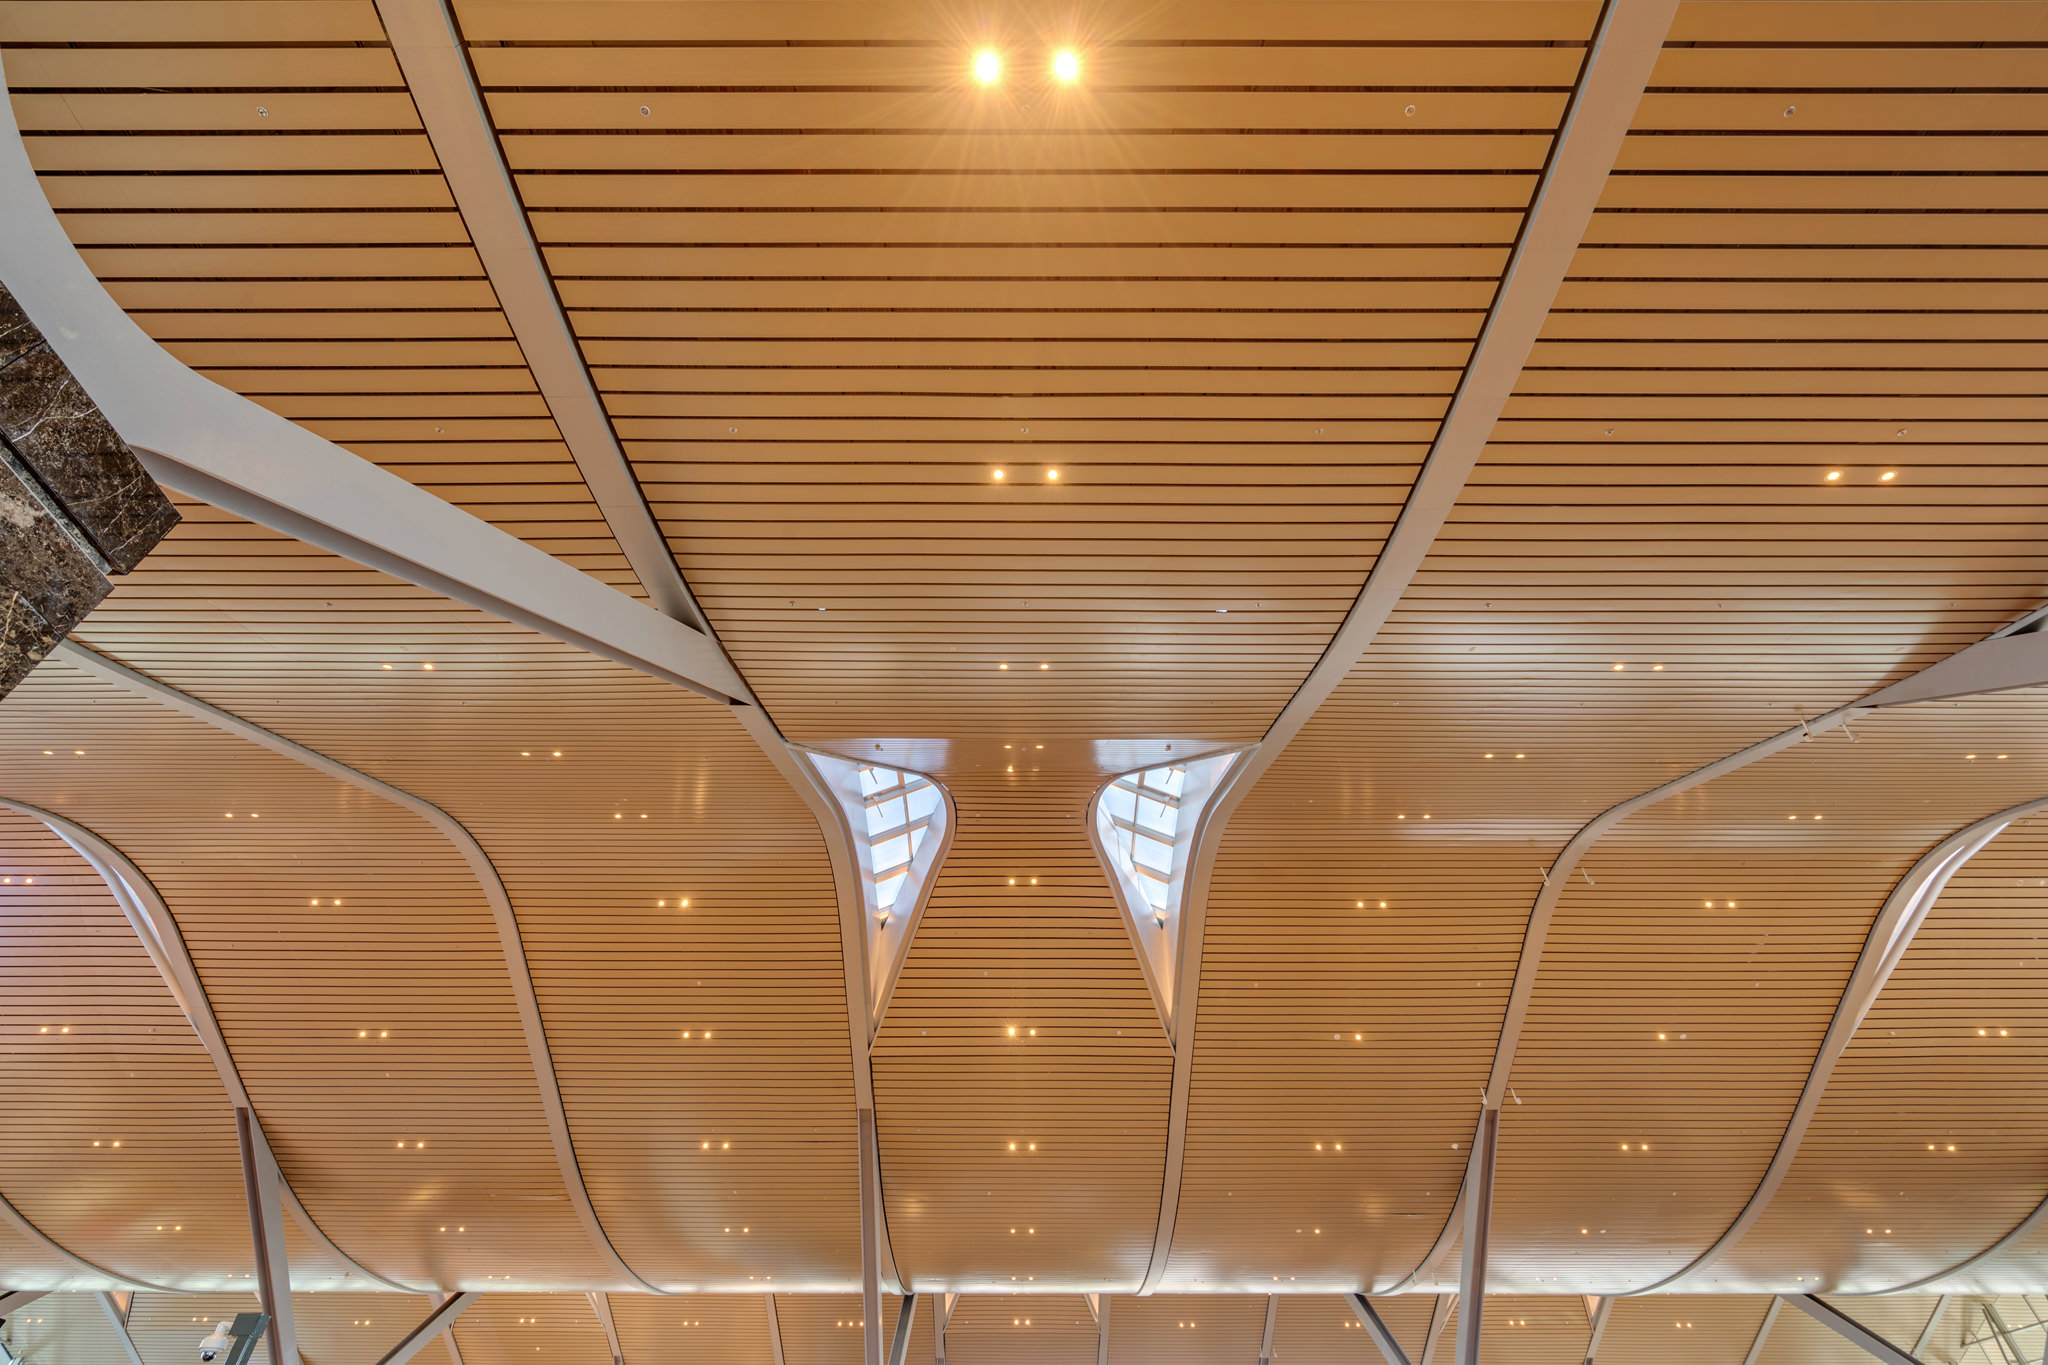 20180626 - Cam Ranh Airport - Architecture - 0330.jpg